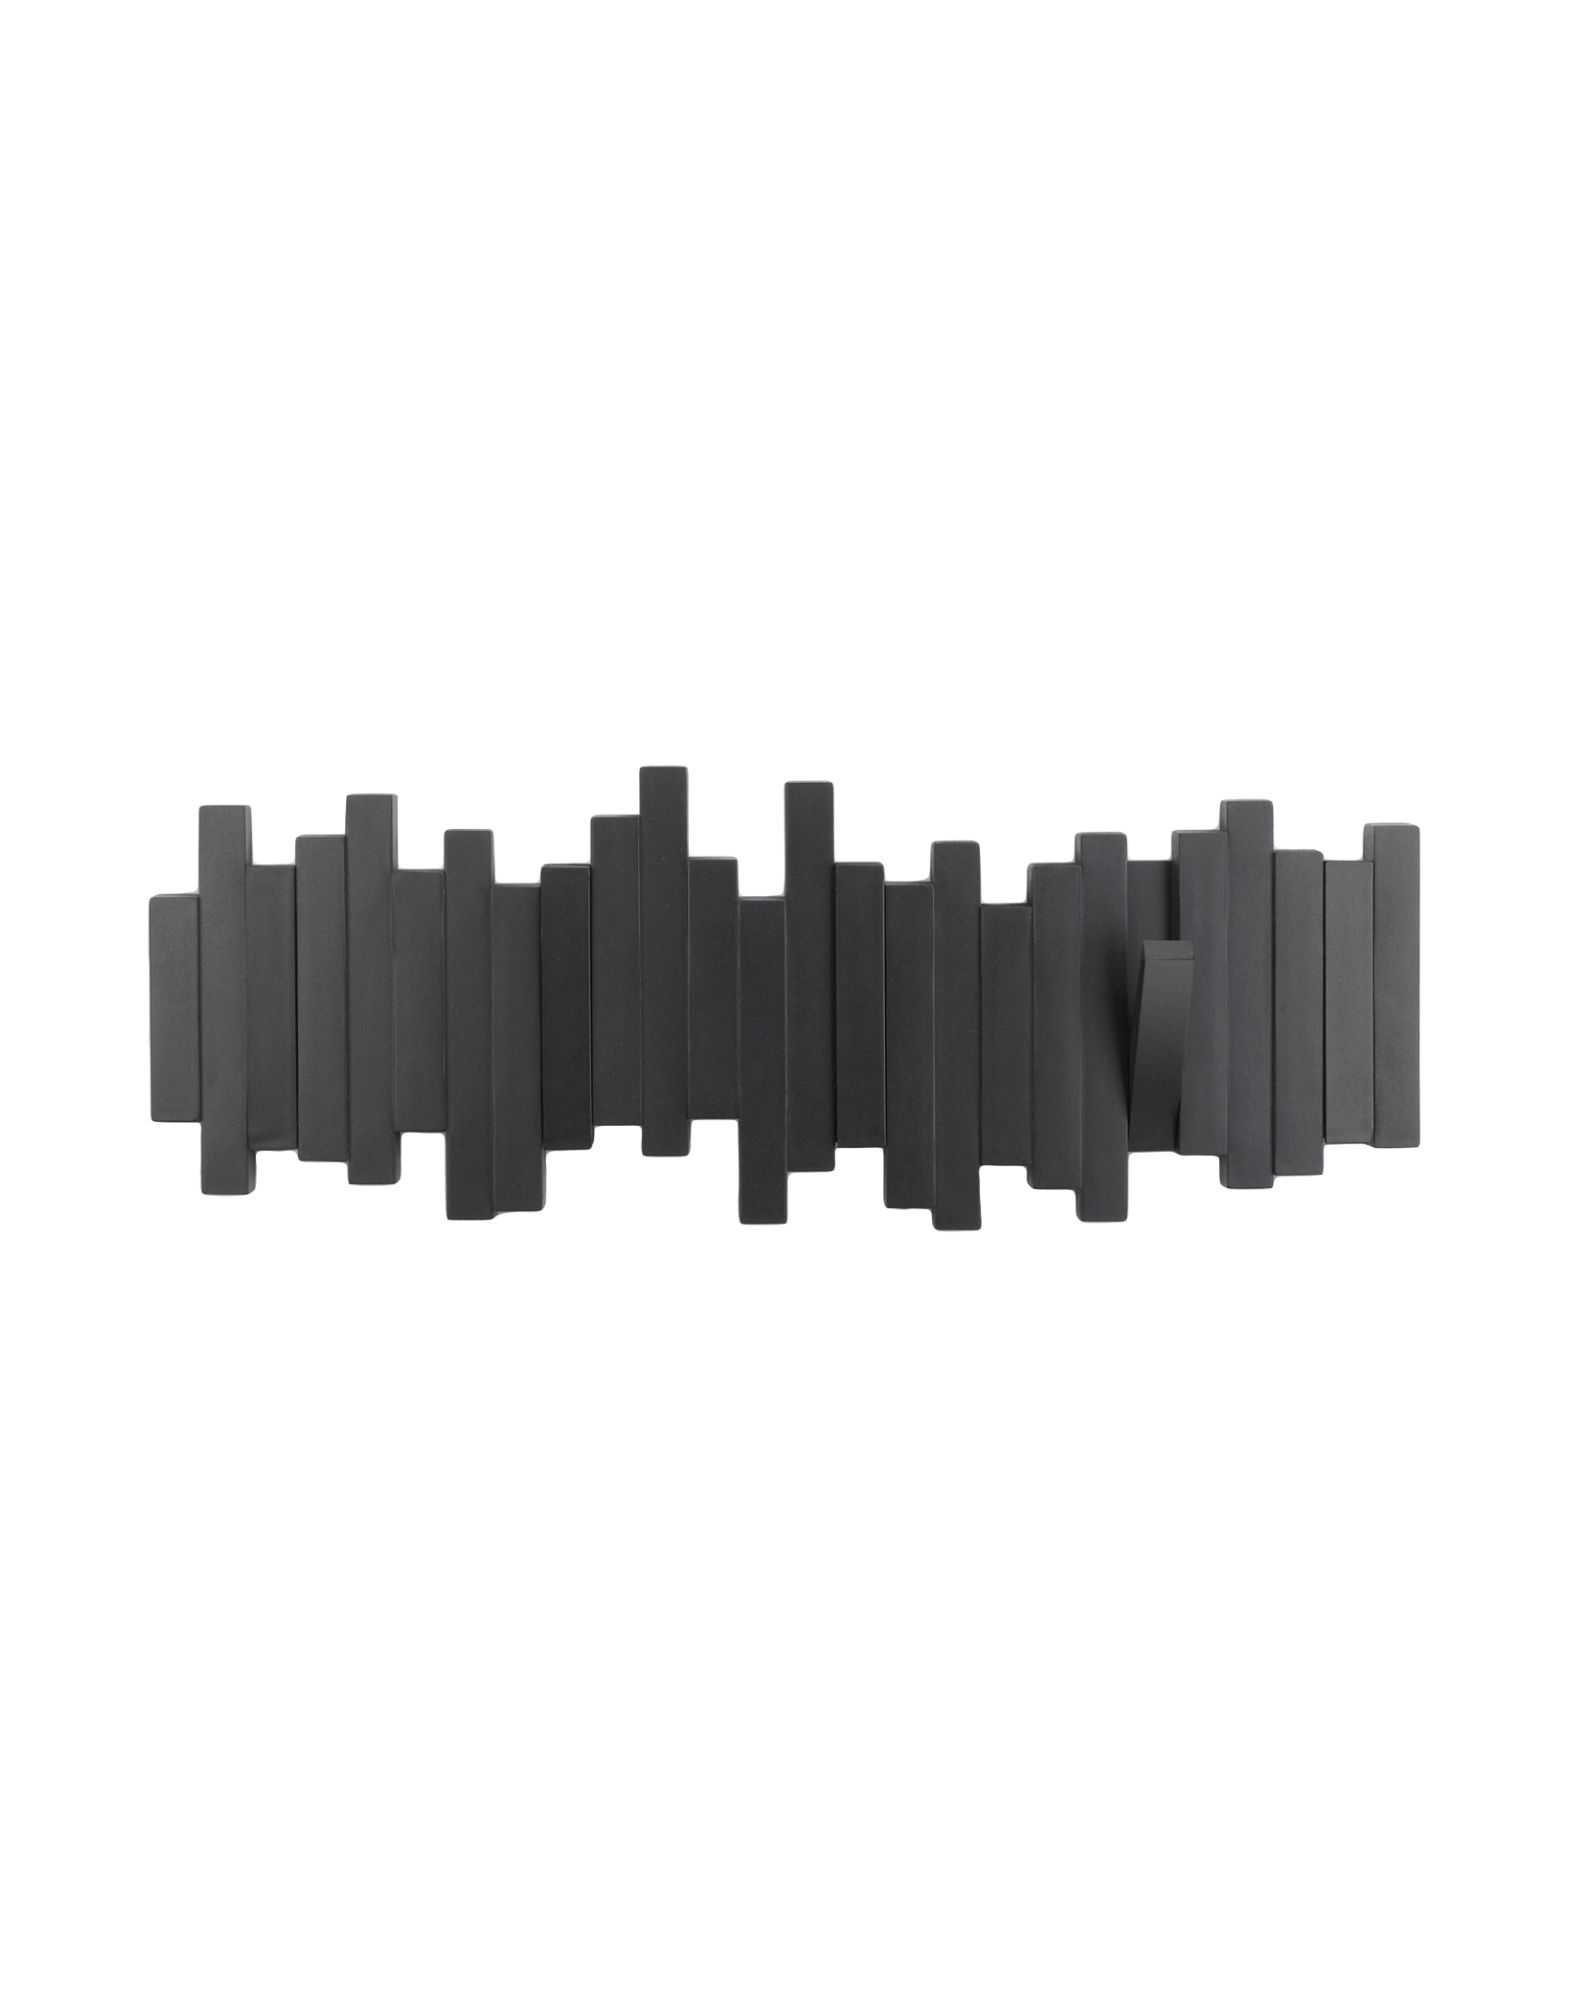 UMBRA Coat racks  Item 58013525 1